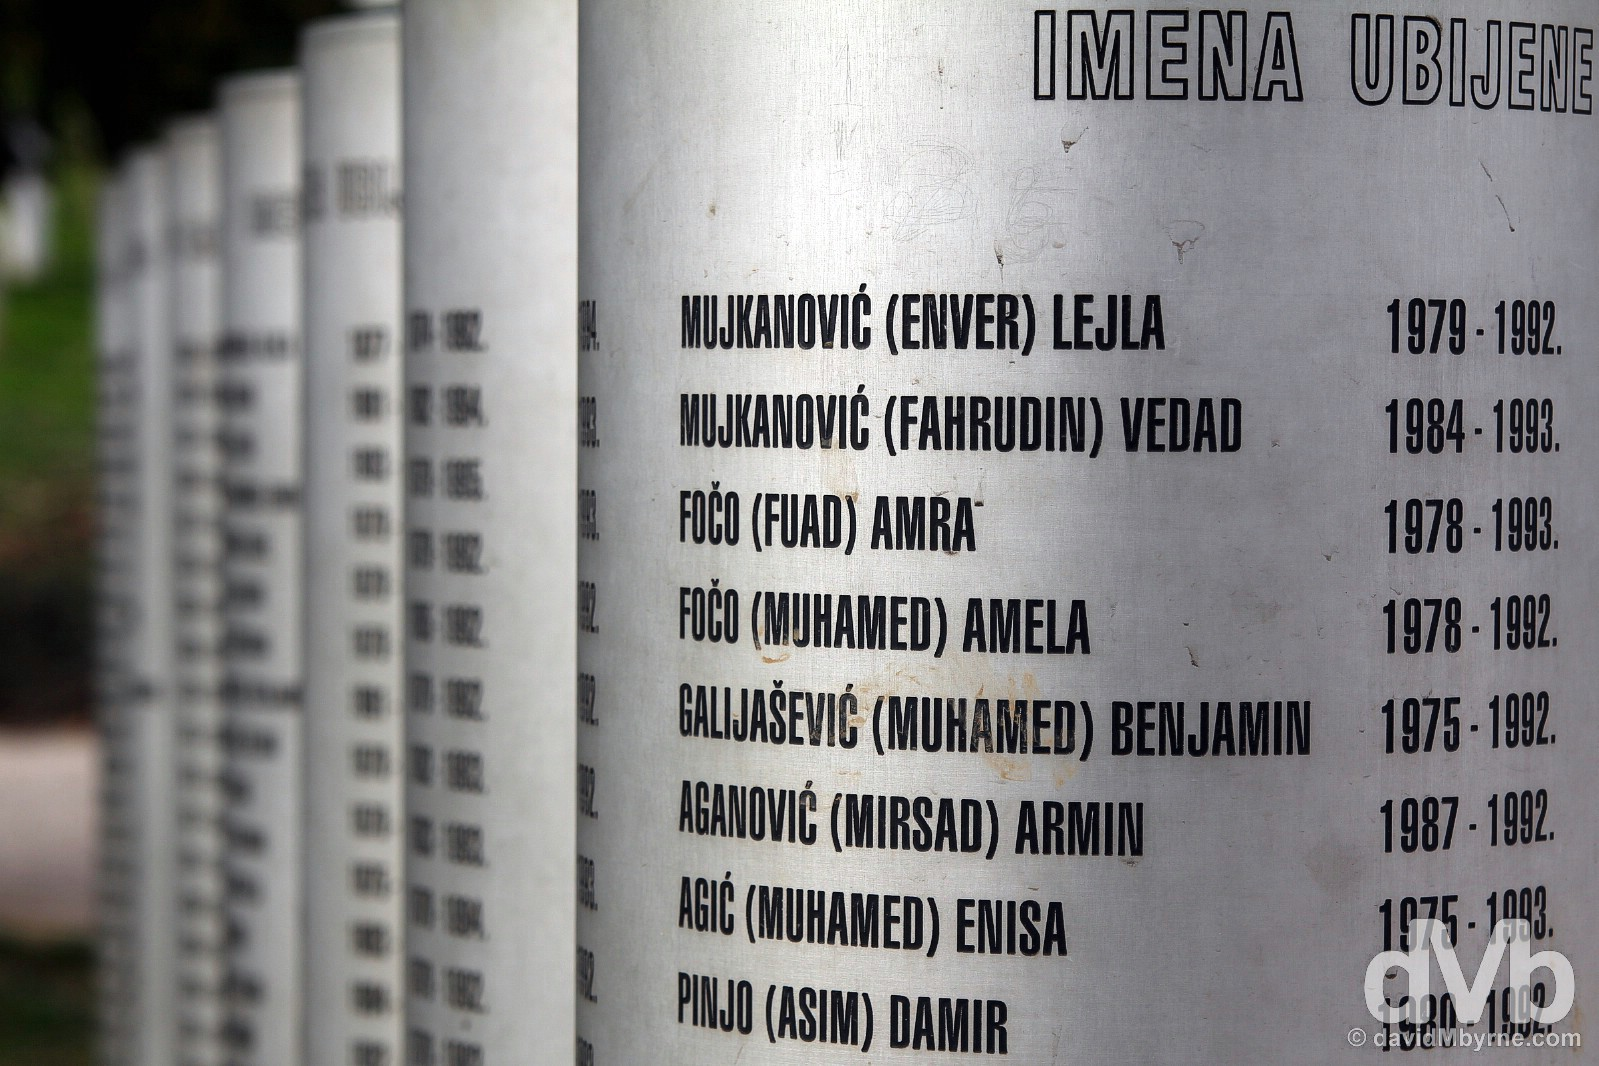 Bosnian War dead listed in Sarajevo, Bosnia and Herzegovina. April 4, 2015.